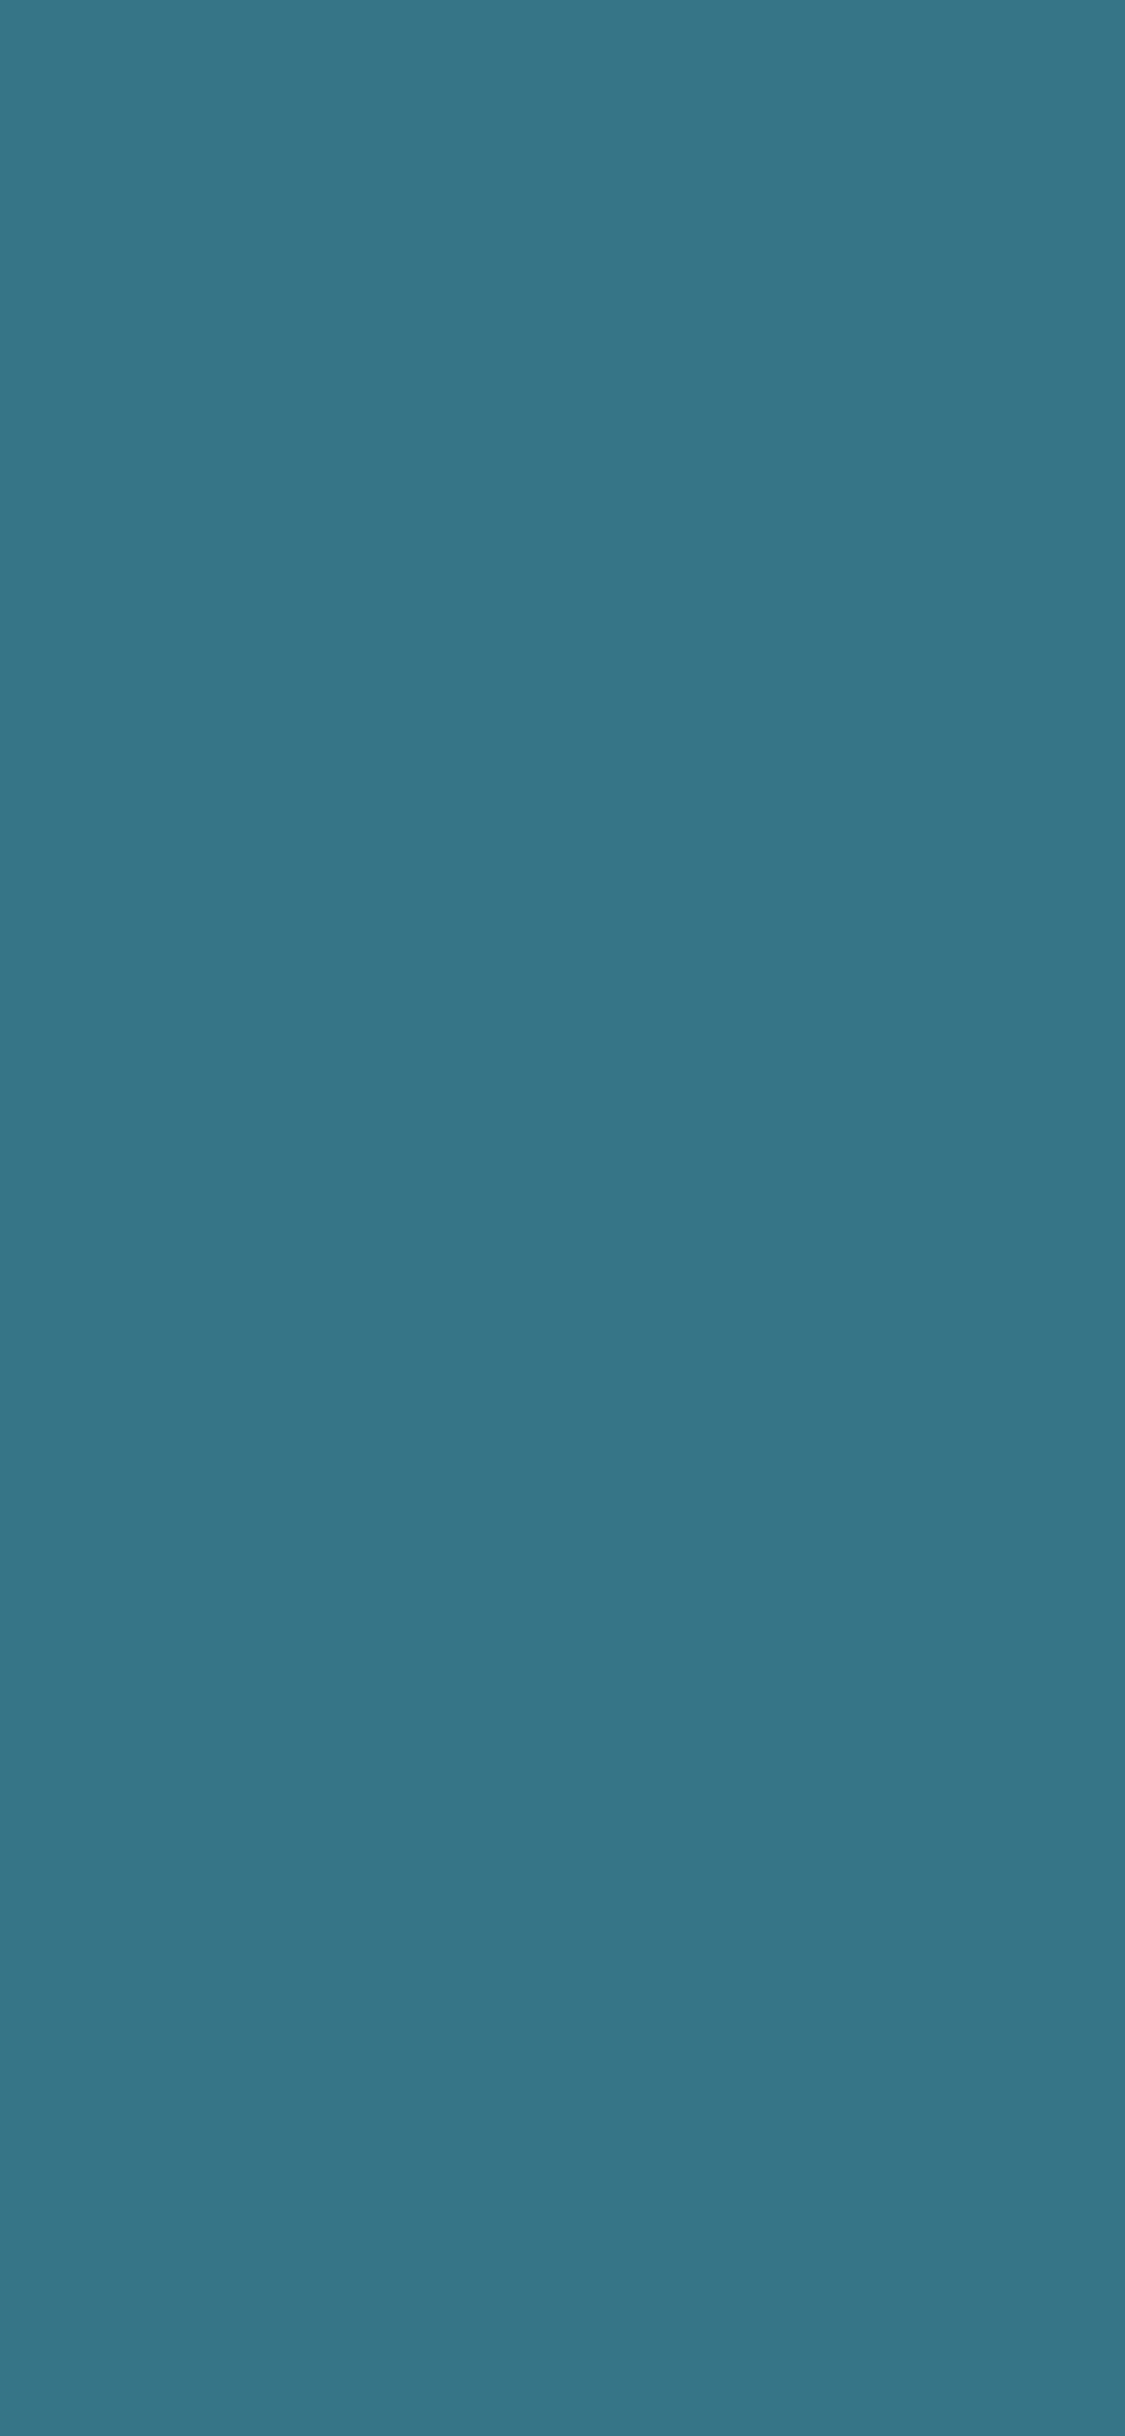 1125x2436 Teal Blue Solid Color Background